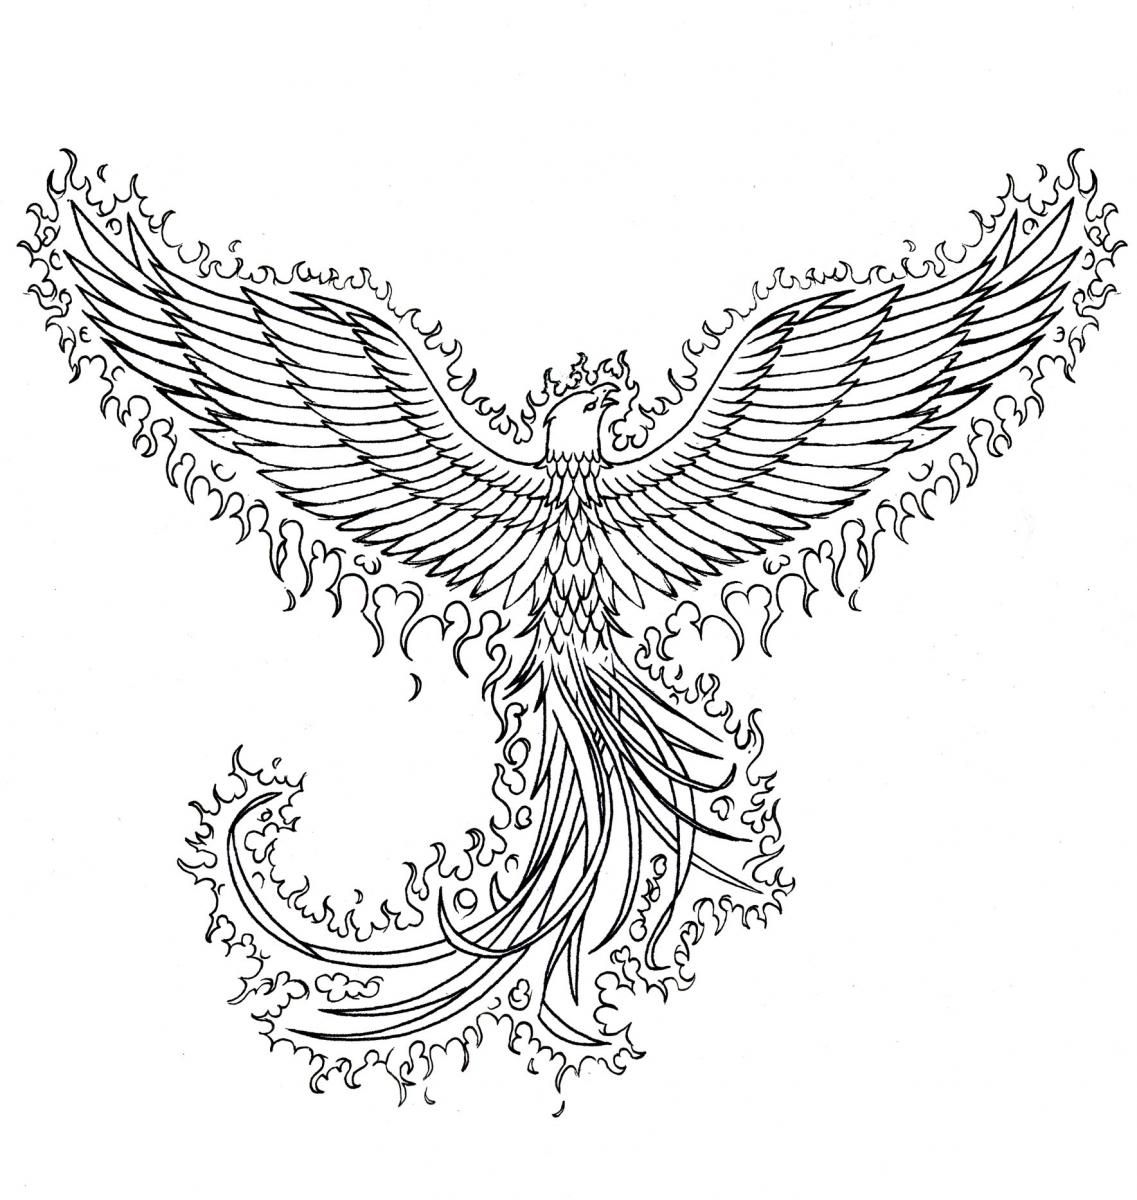 Bird Line Drawing Tattoo : Drawing of the phoenix bird ink line art